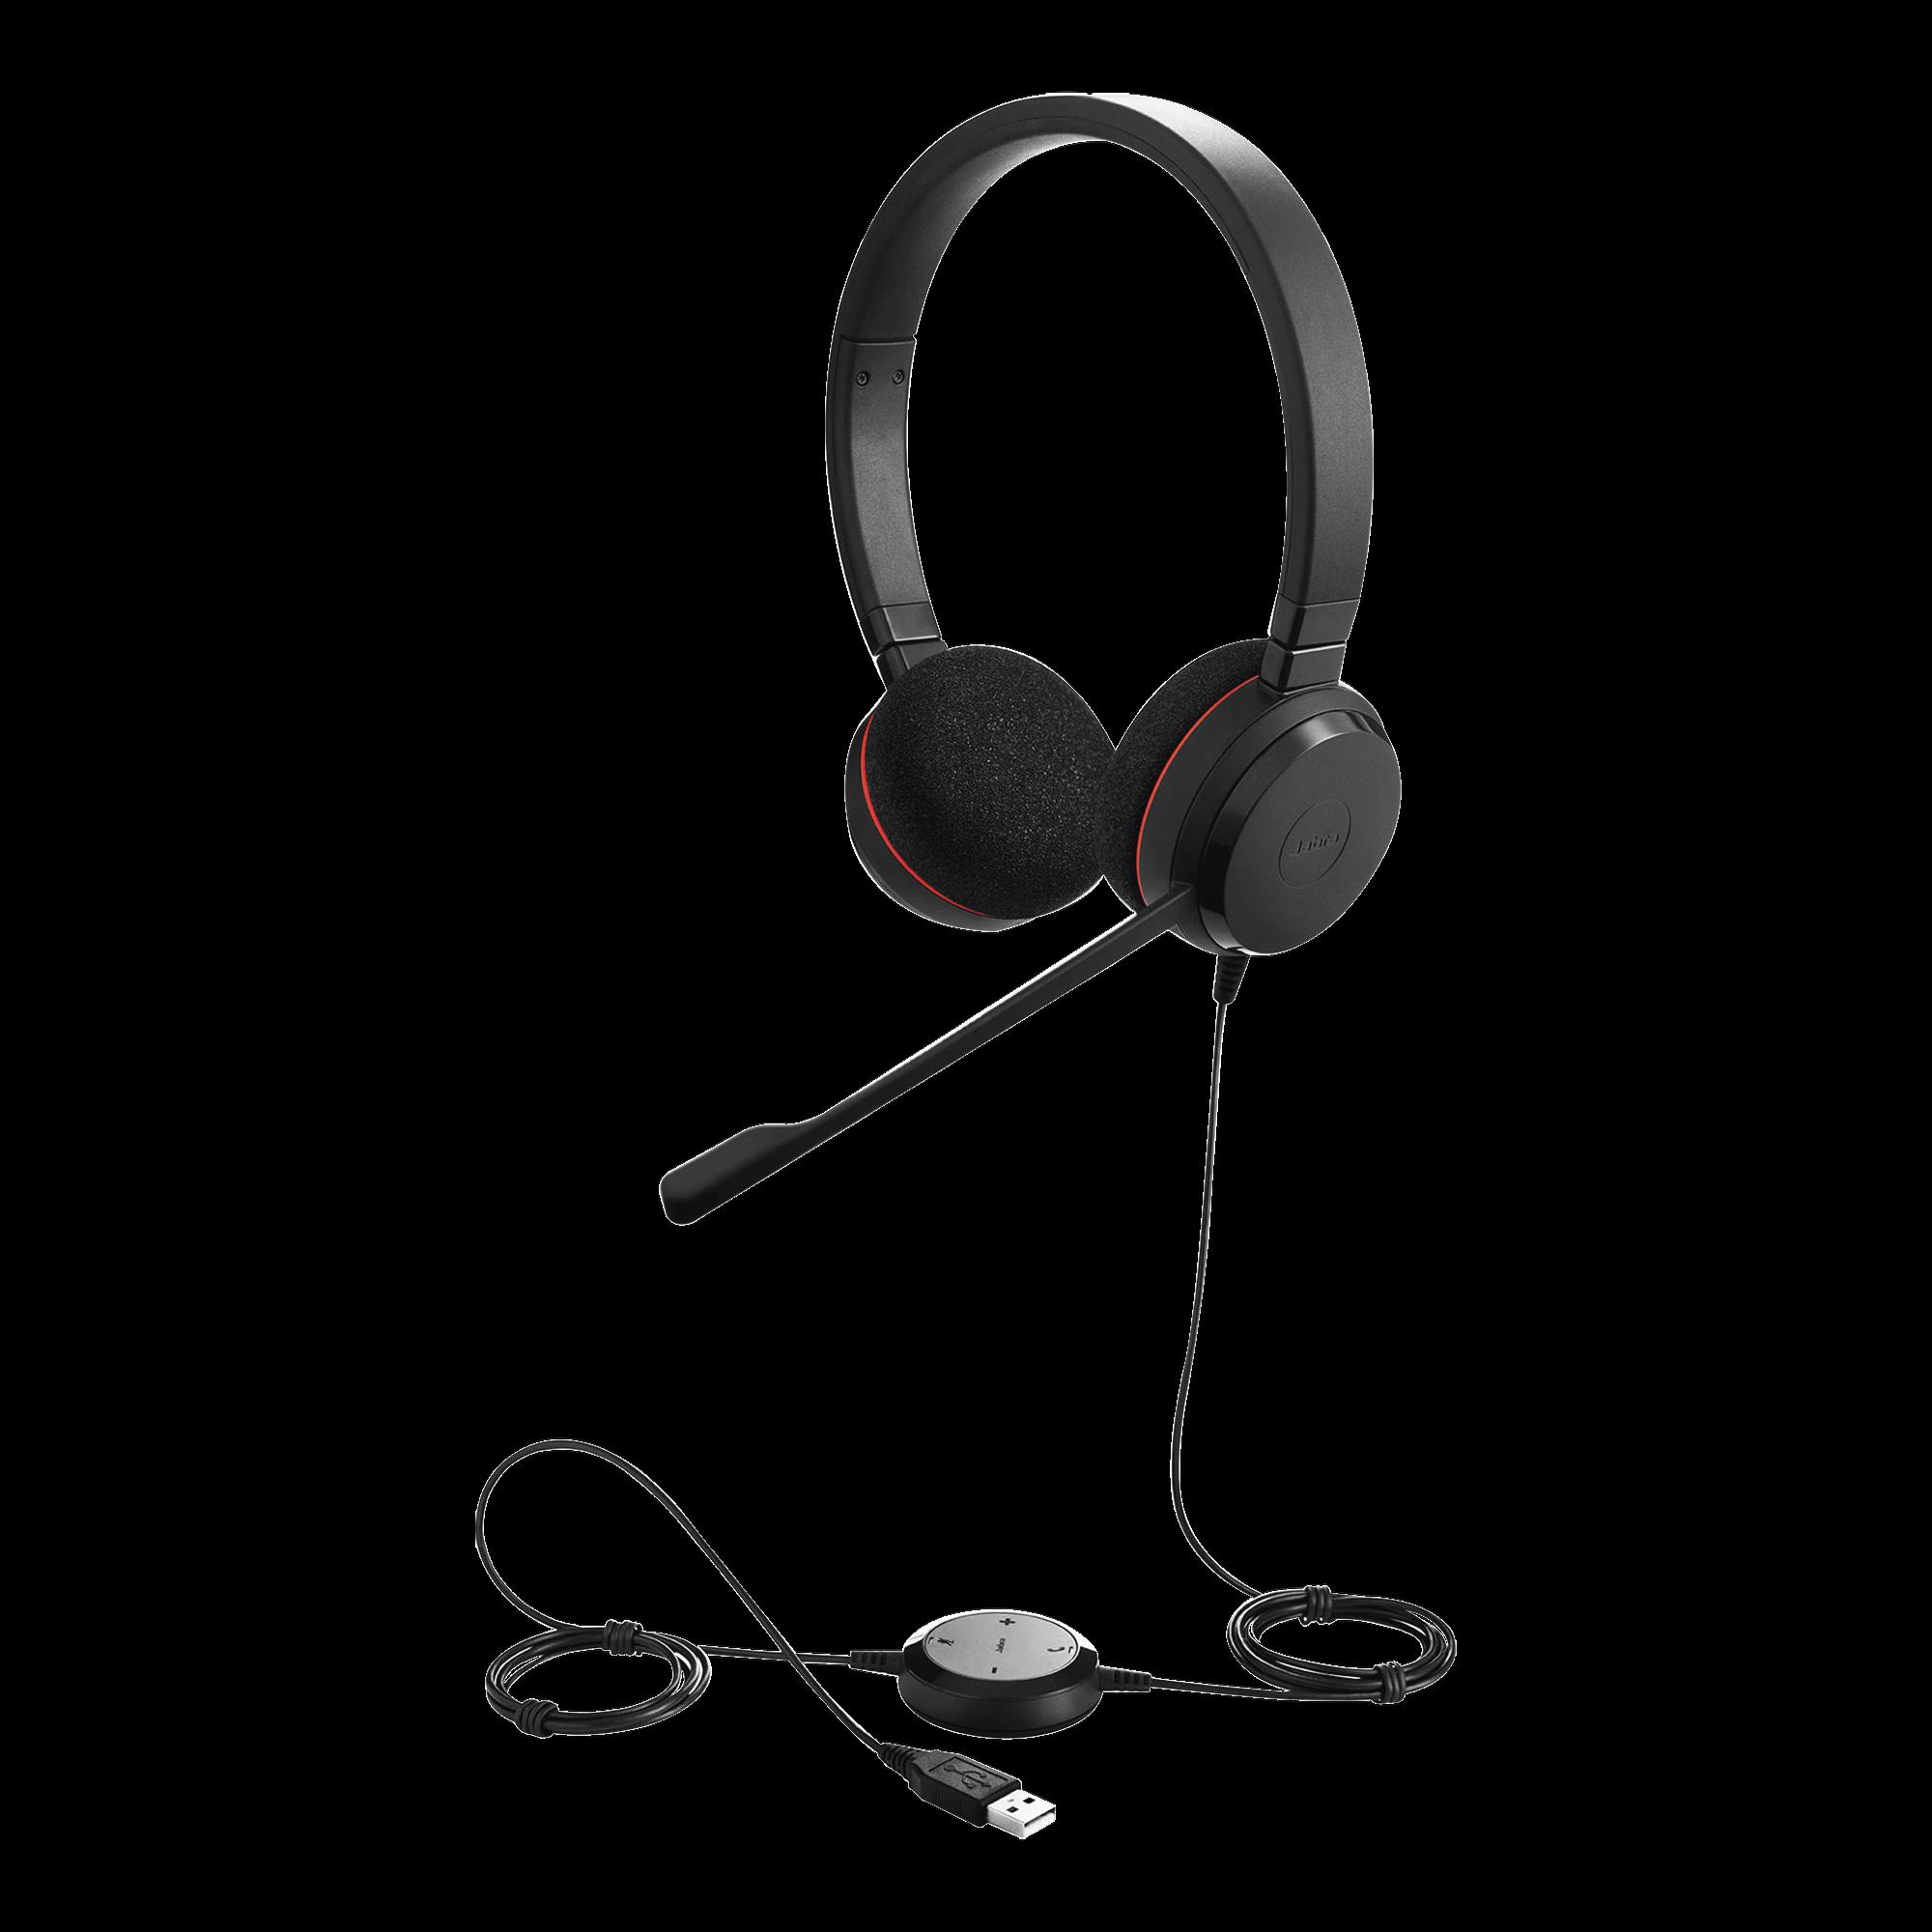 Jabra Evolve 20 DUO con conexión USB, micrófono con cancelación de ruido de ultima generación, configuración Plug and Play (4999-829-209)